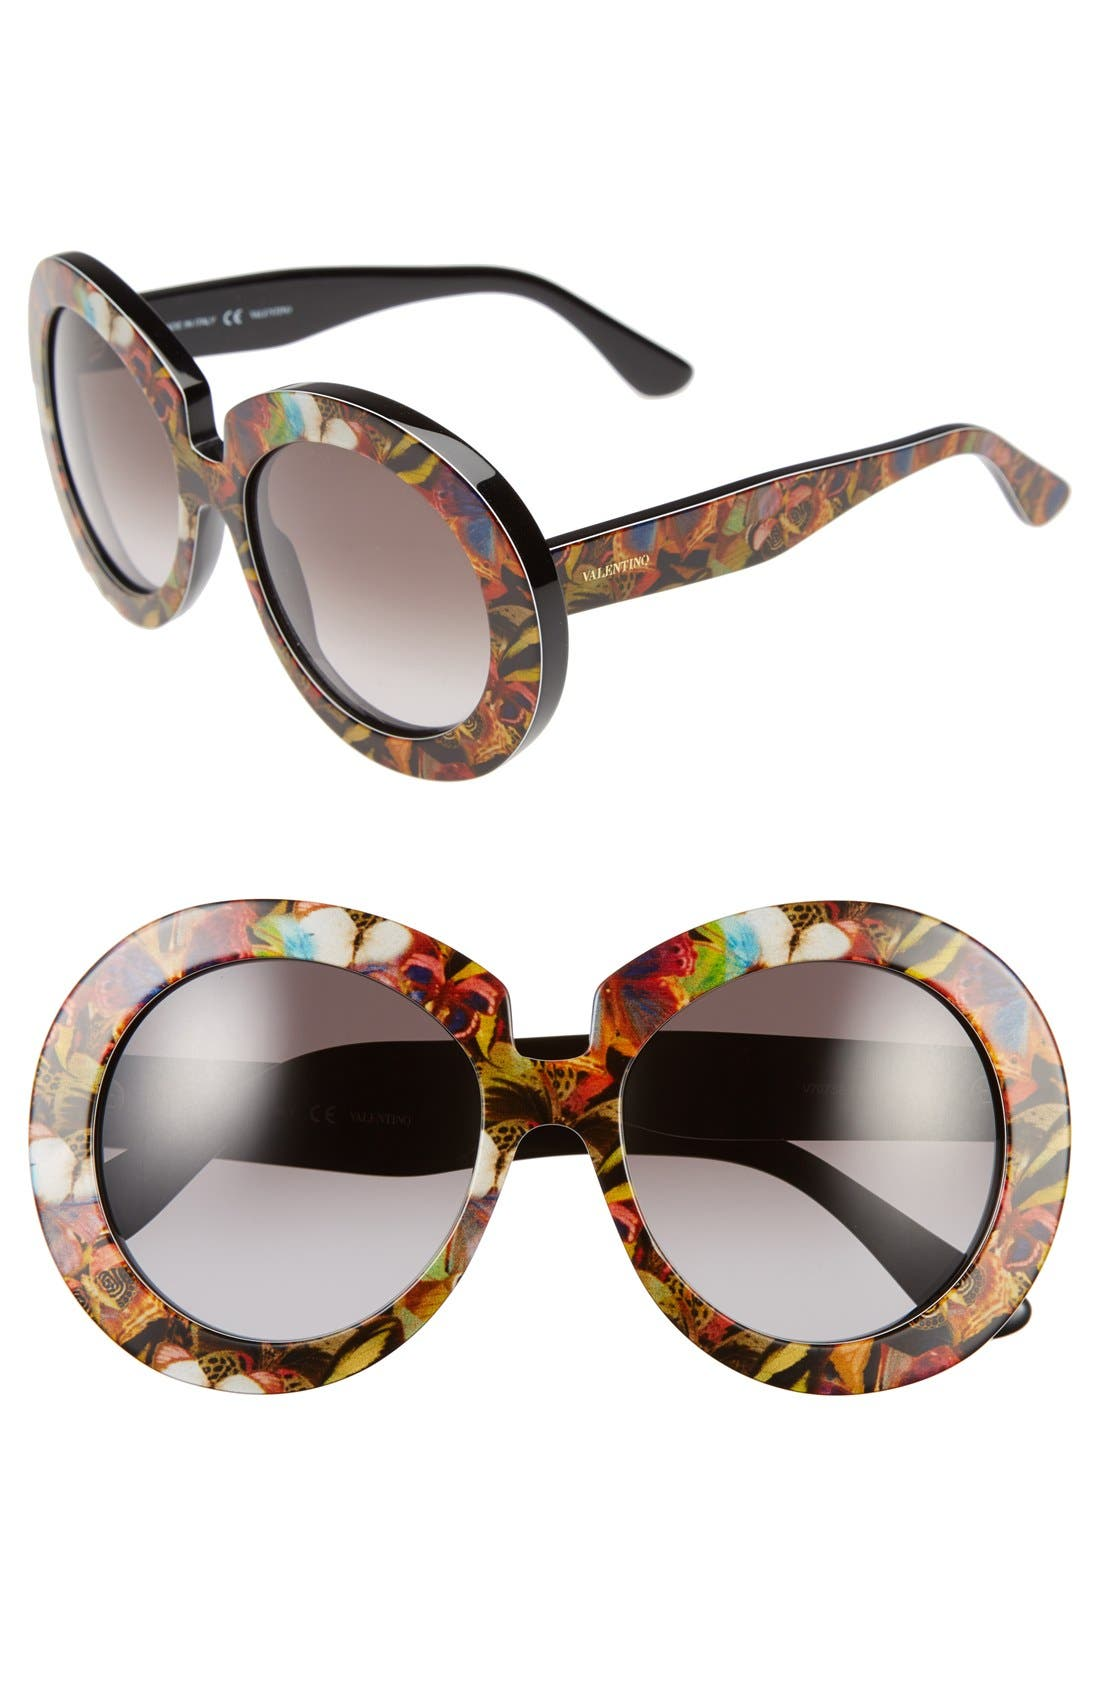 Main Image - Valentino 54mm Oversized Gradient Sunglasses